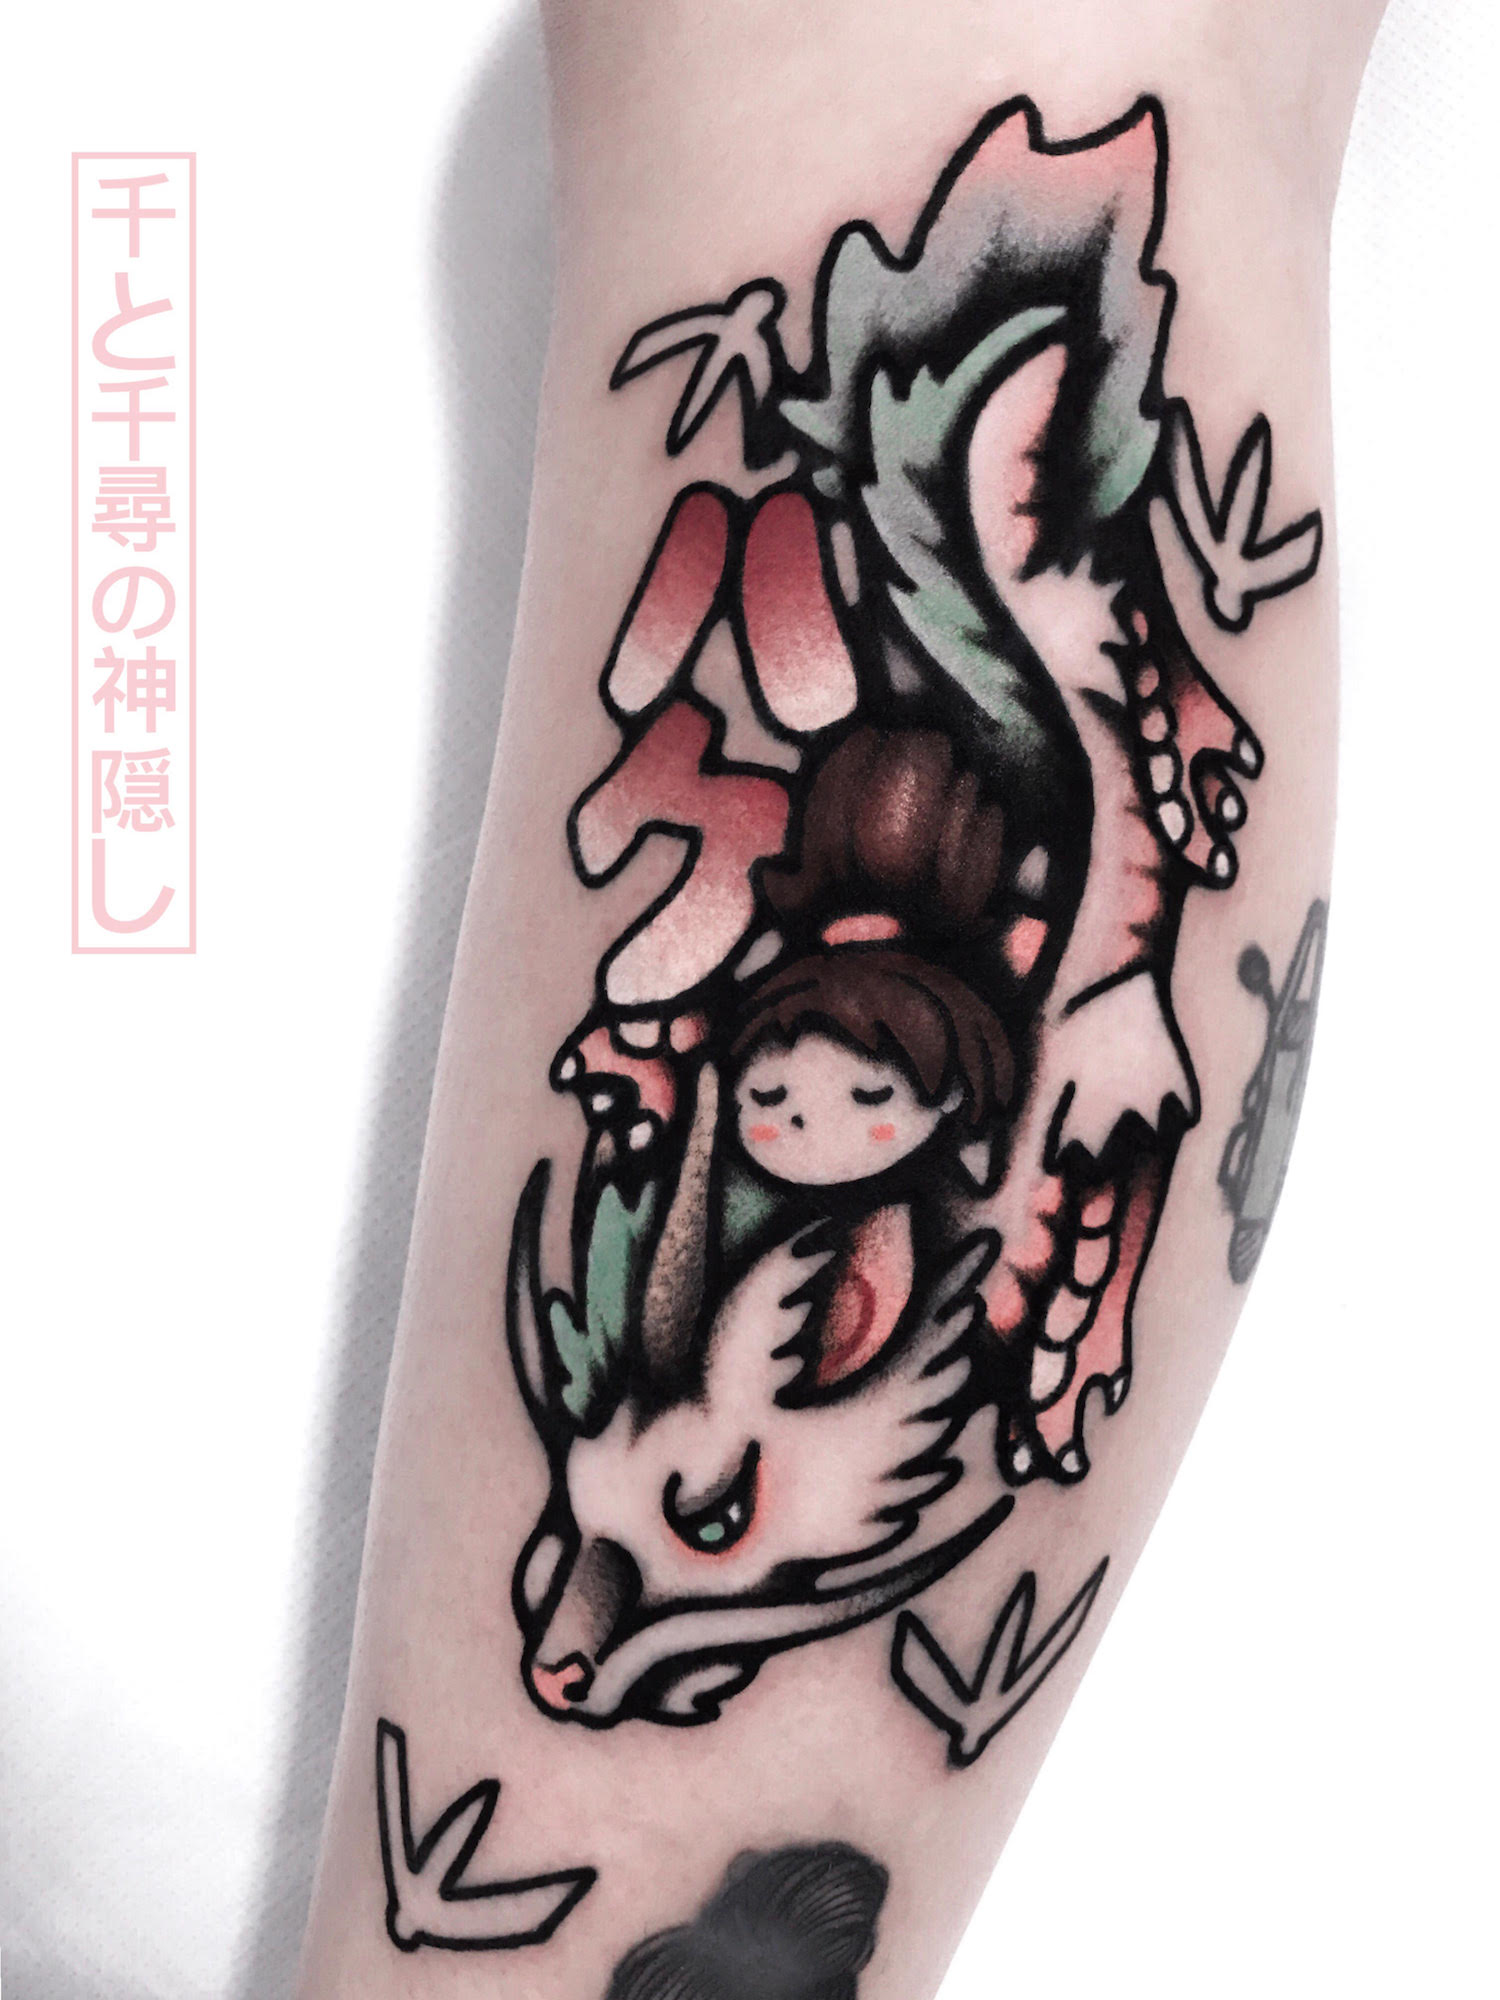 Girl riding creature tattoo on leg